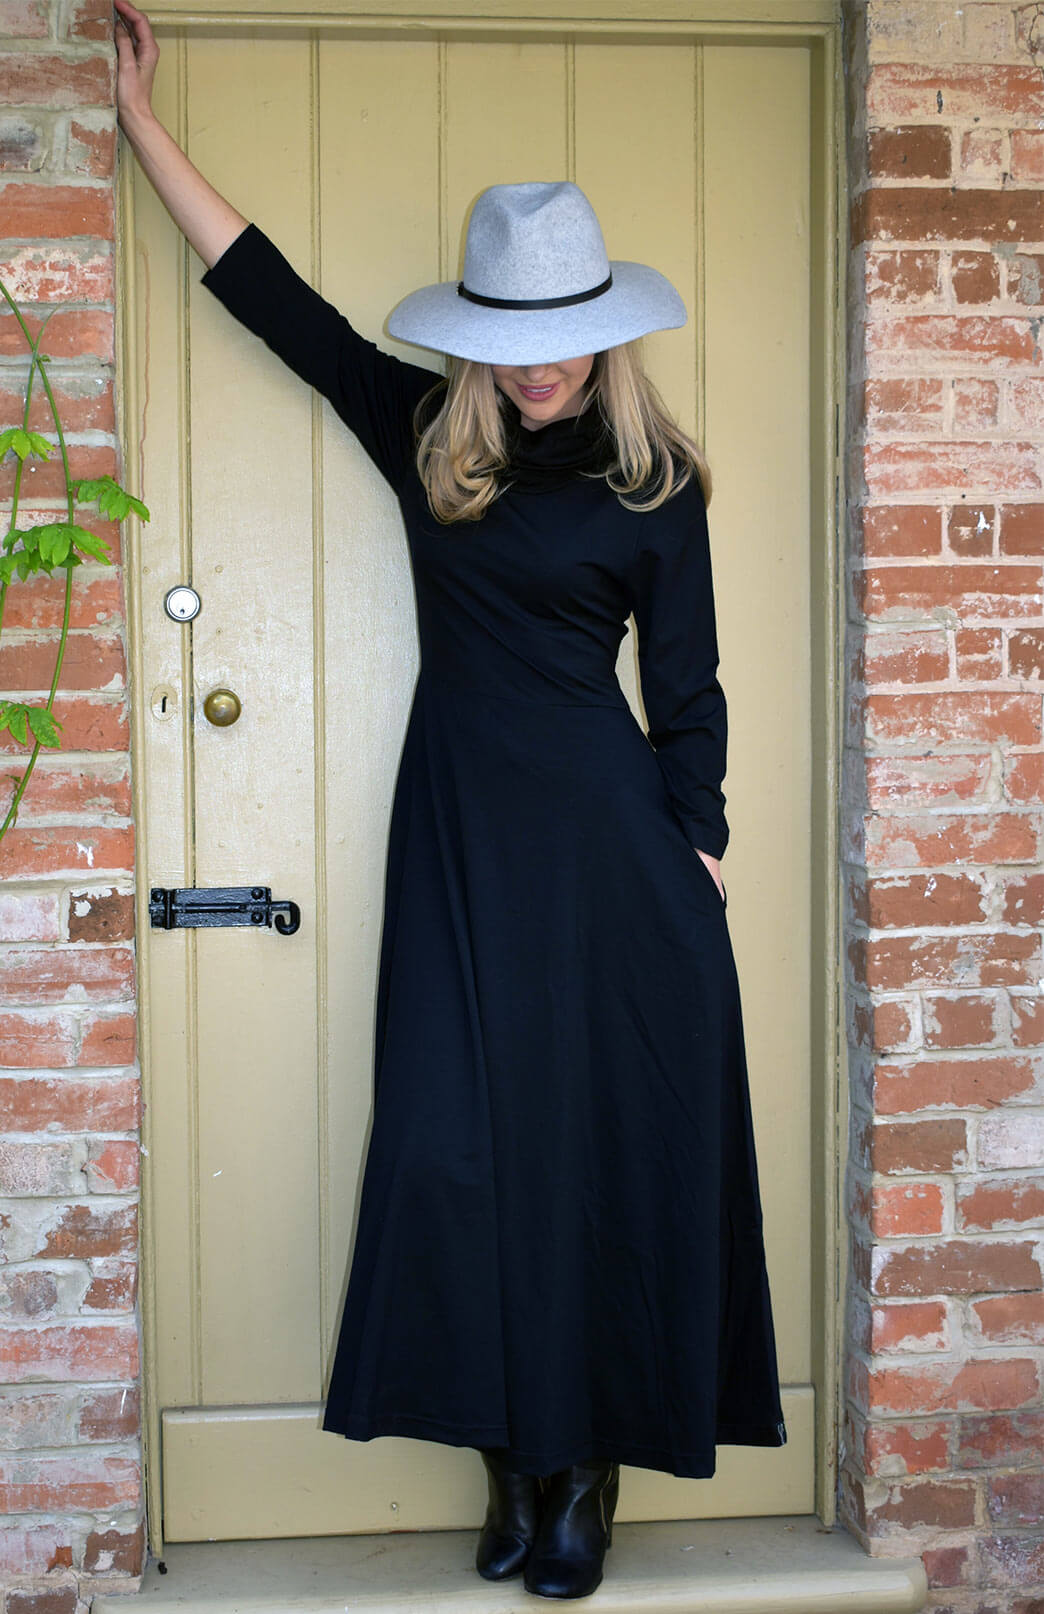 Florence Dress - Women's black long sleeved merino wool dress with high neckline, side pockets, long skirt and dropped waist - Smitten Merino Tasmania Australia